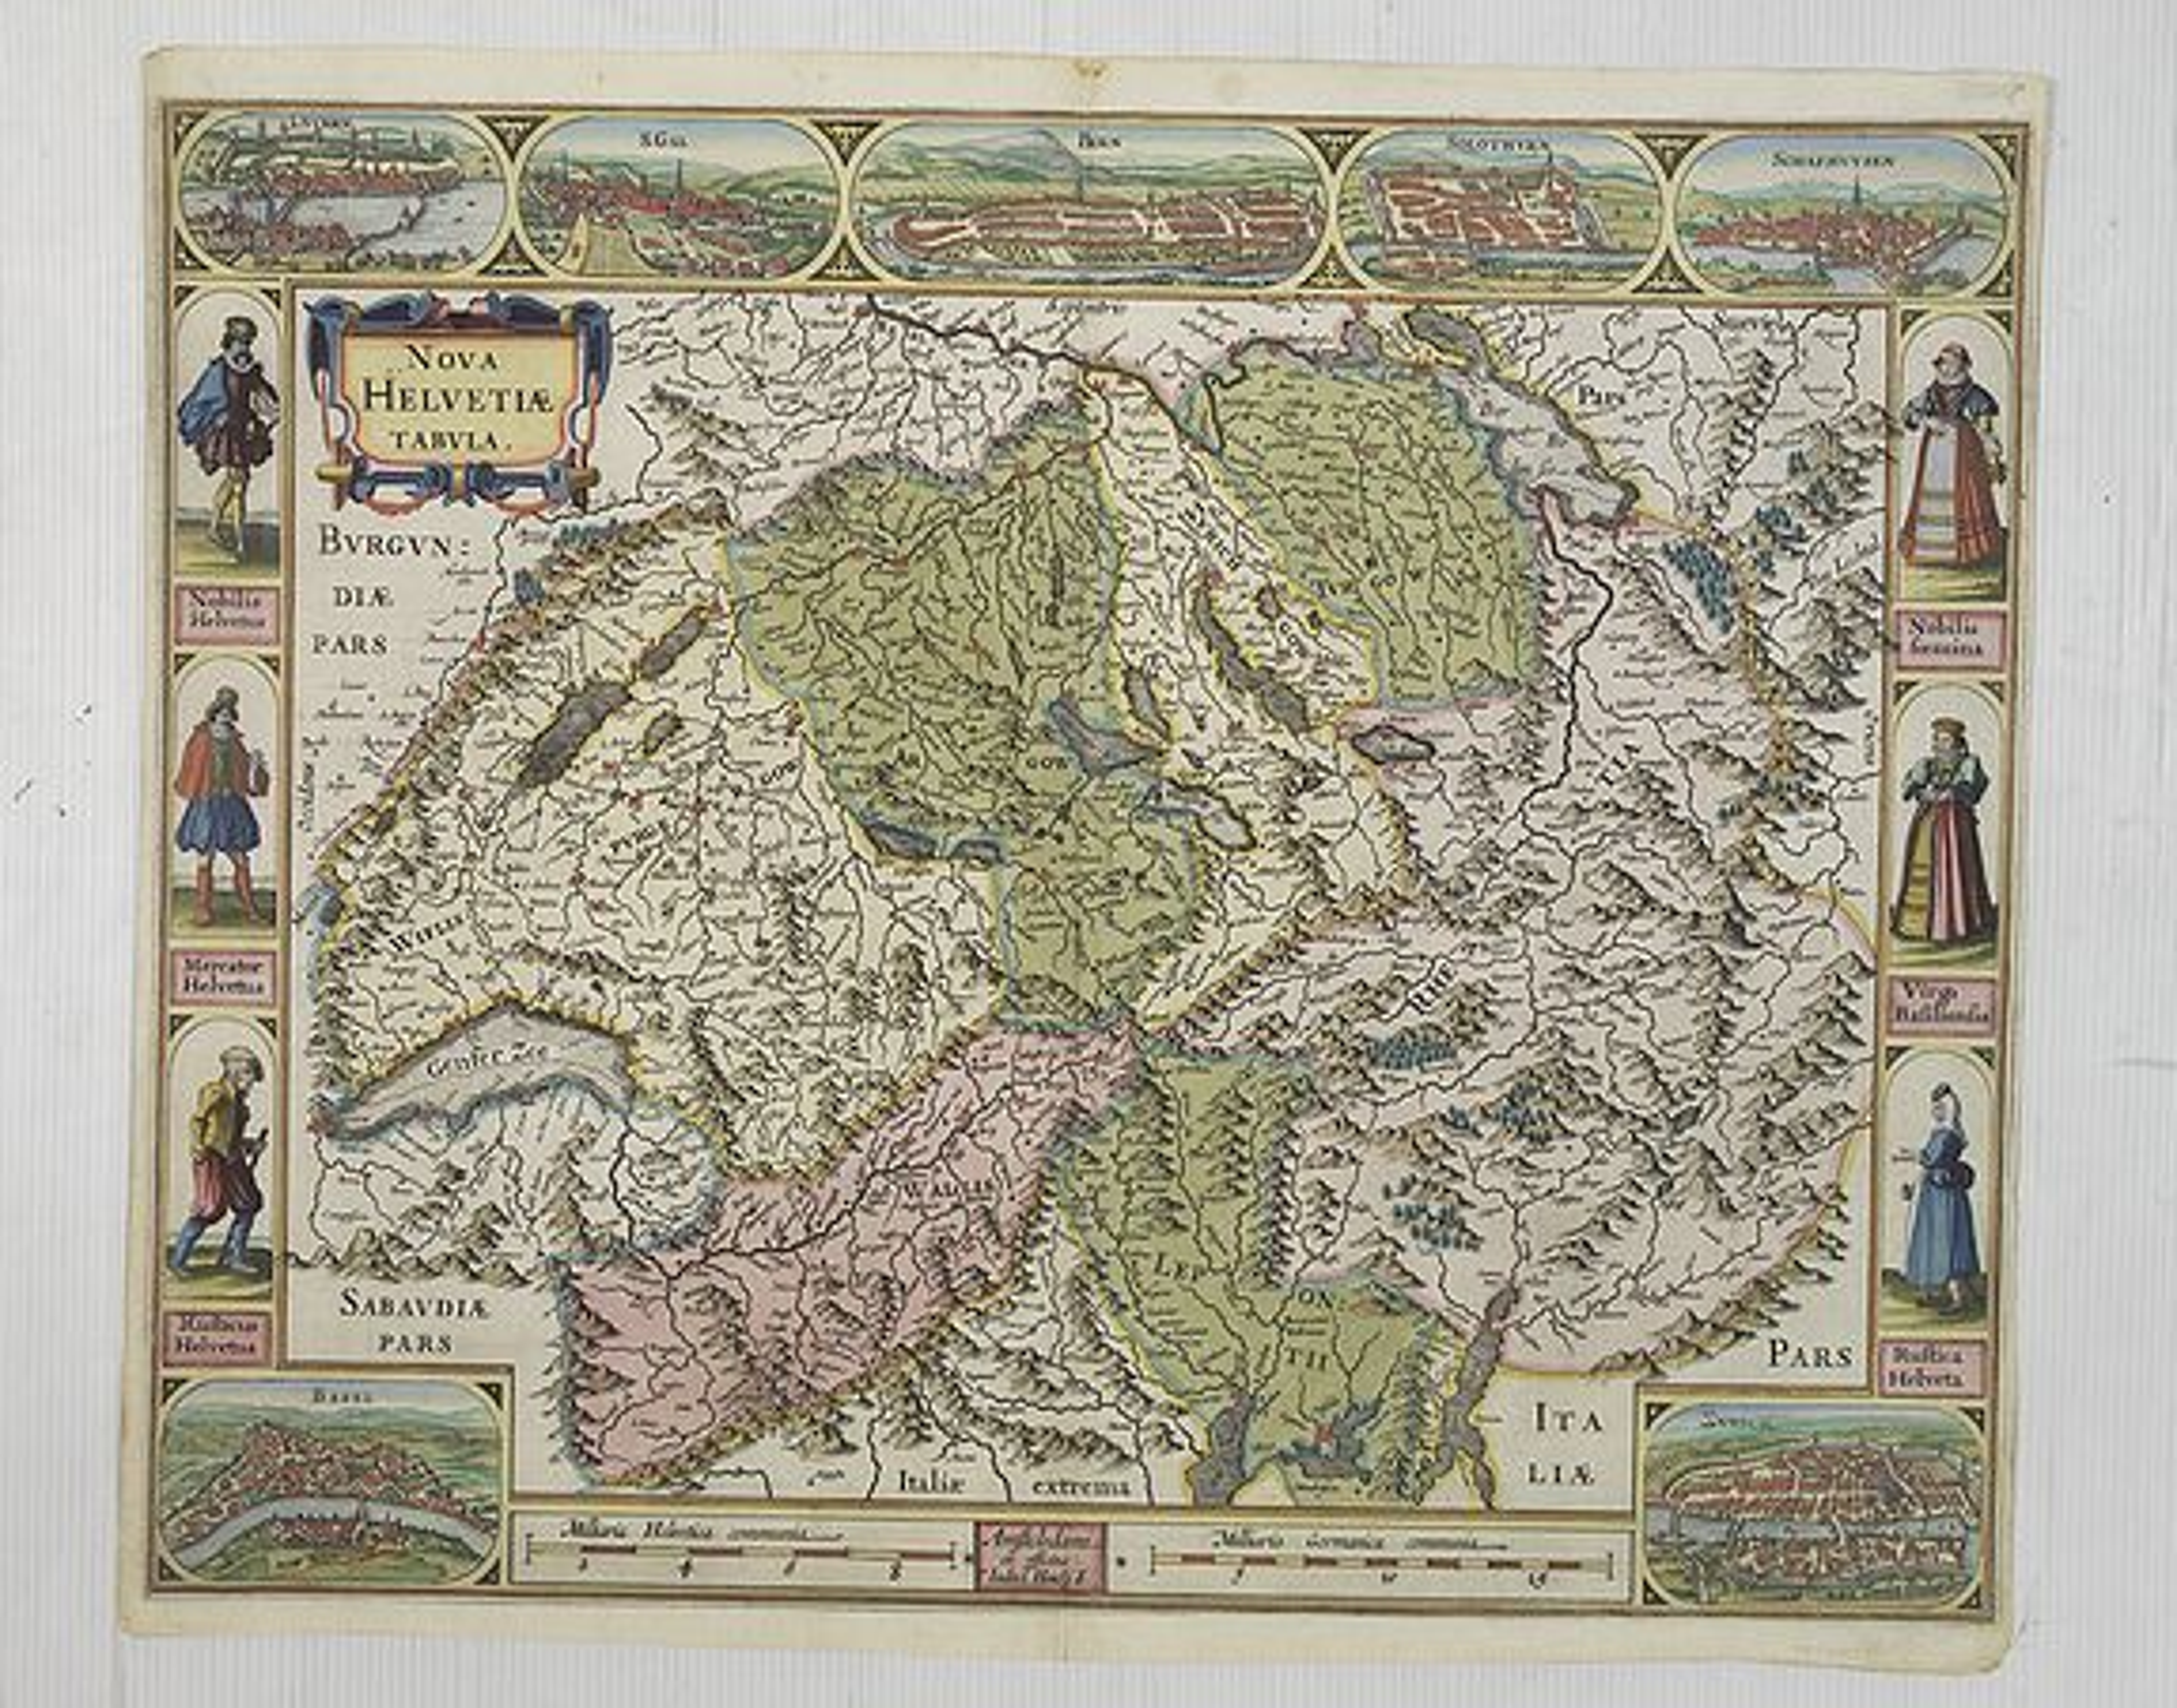 JANSSONIUS, J. -  Nova Helvetiae Tabula.